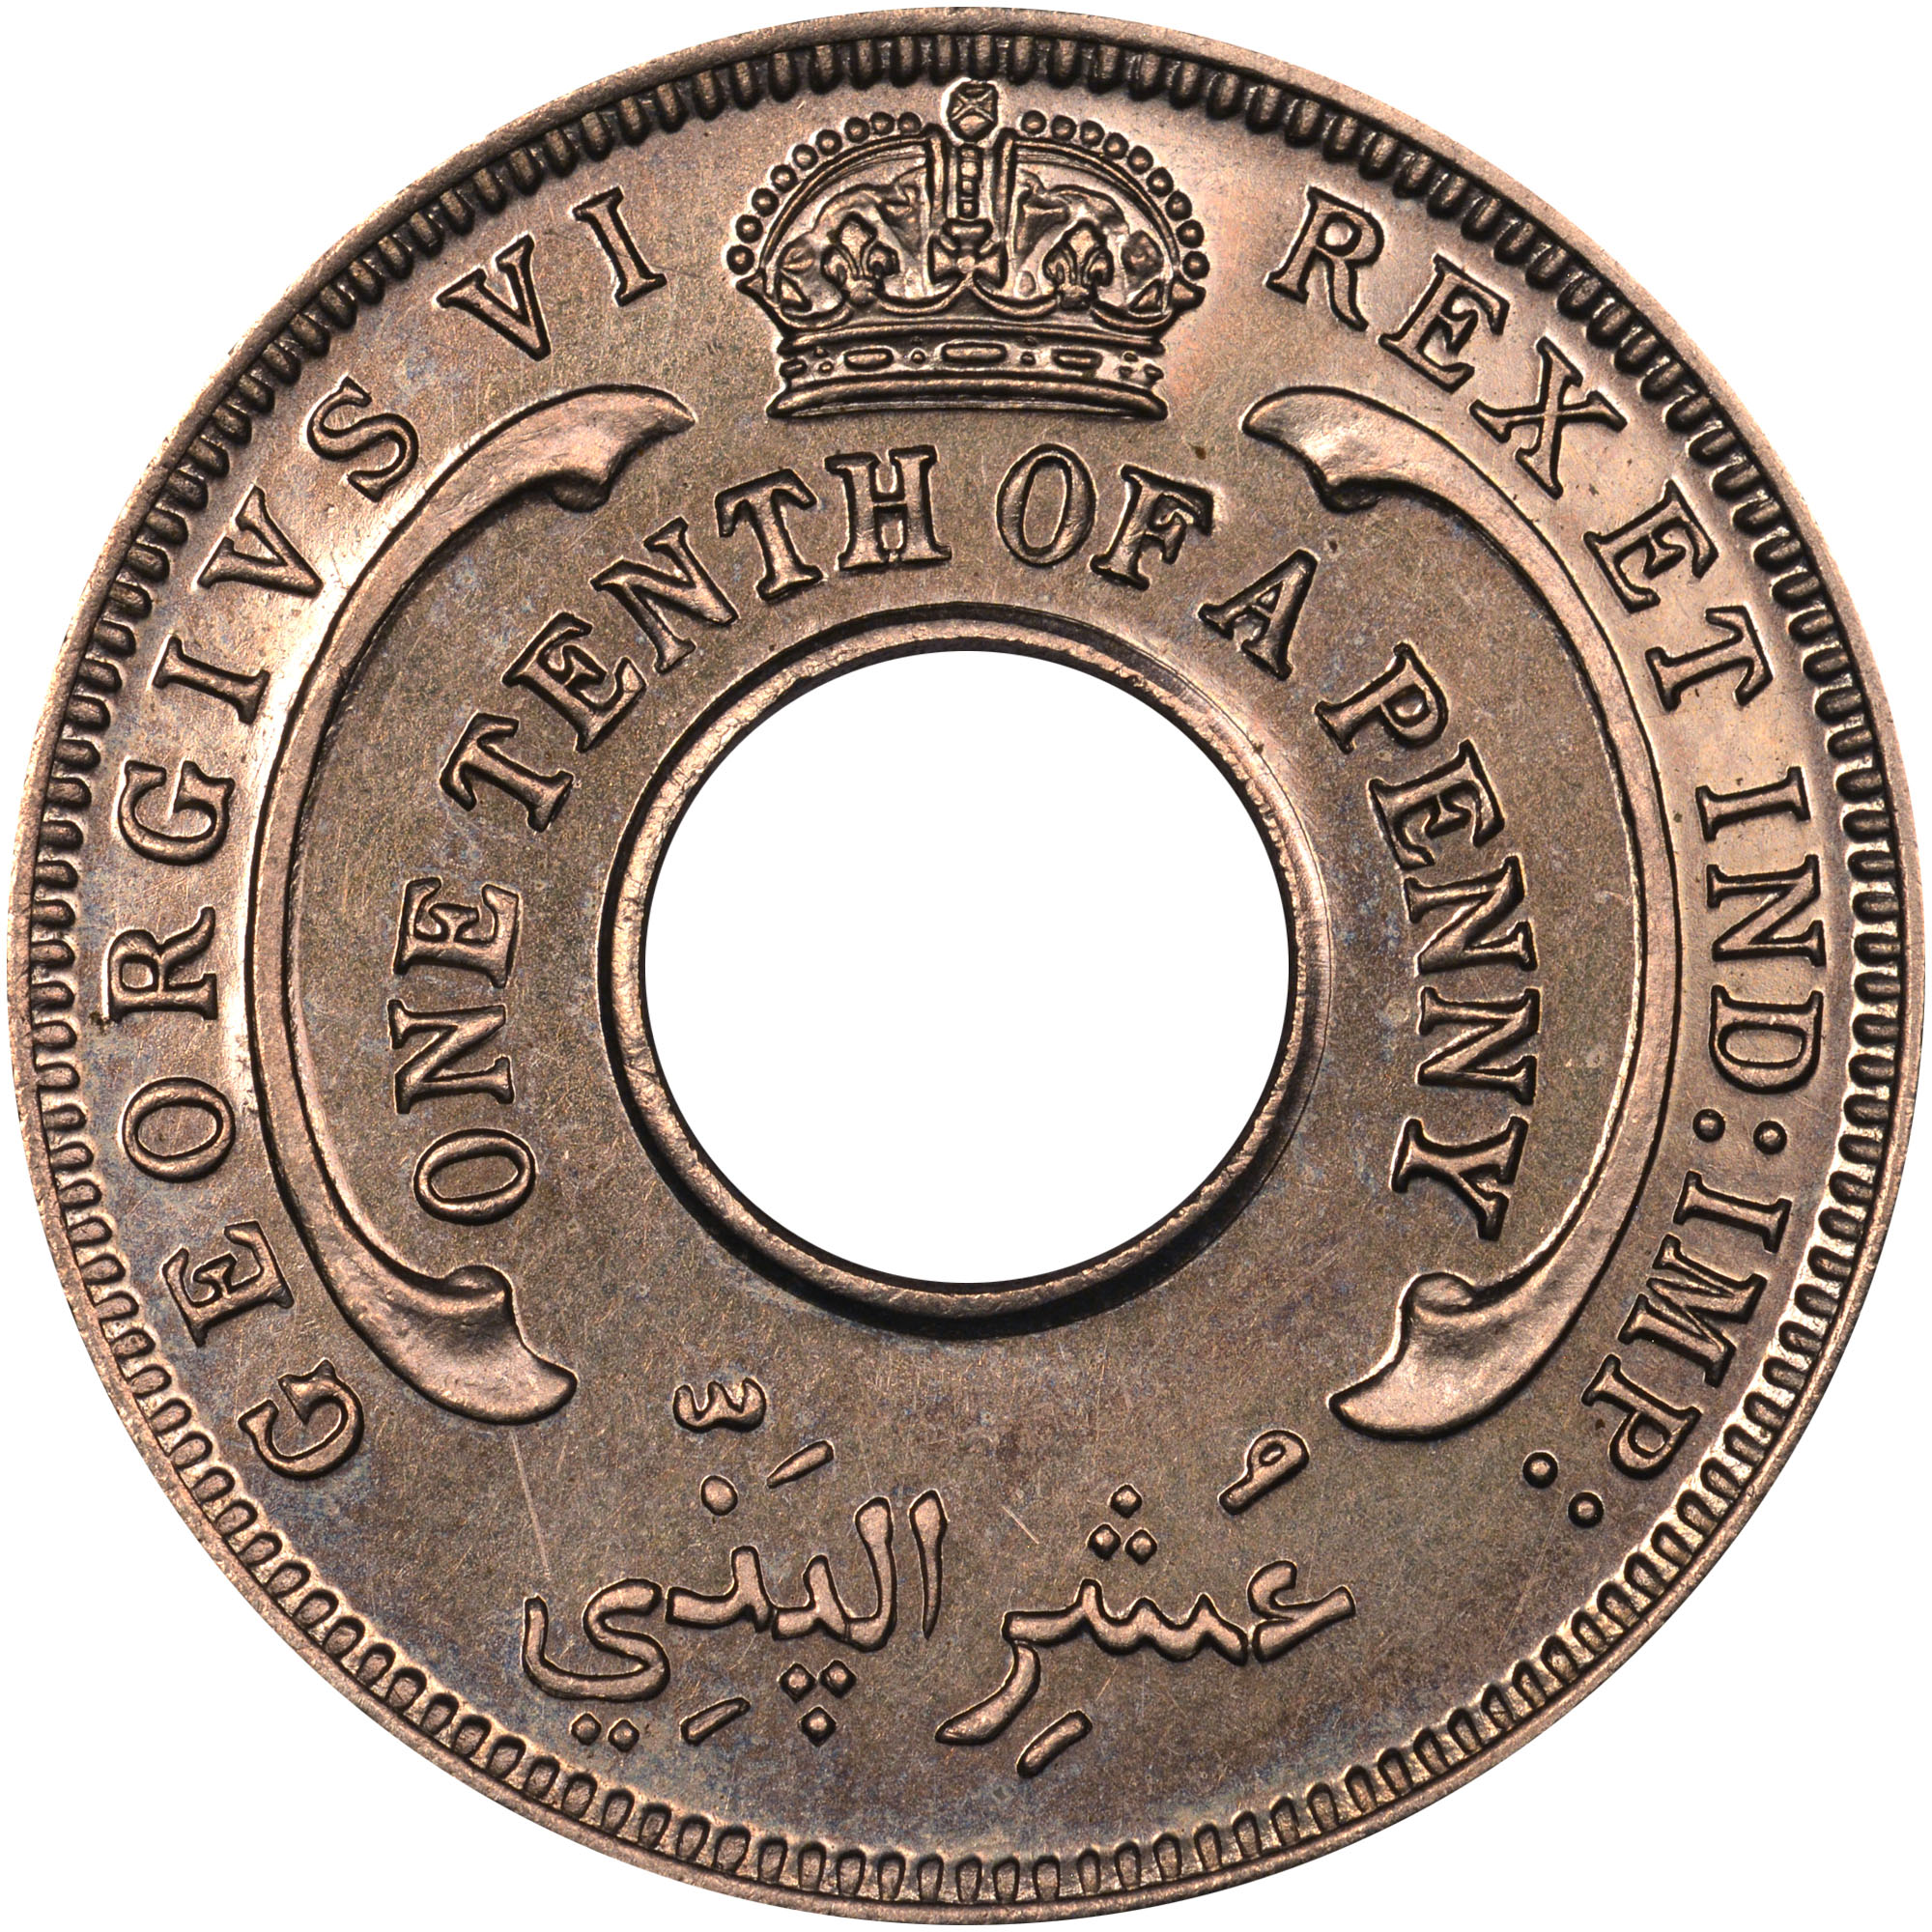 1938-1947 British West Africa 1/10 Penny obverse